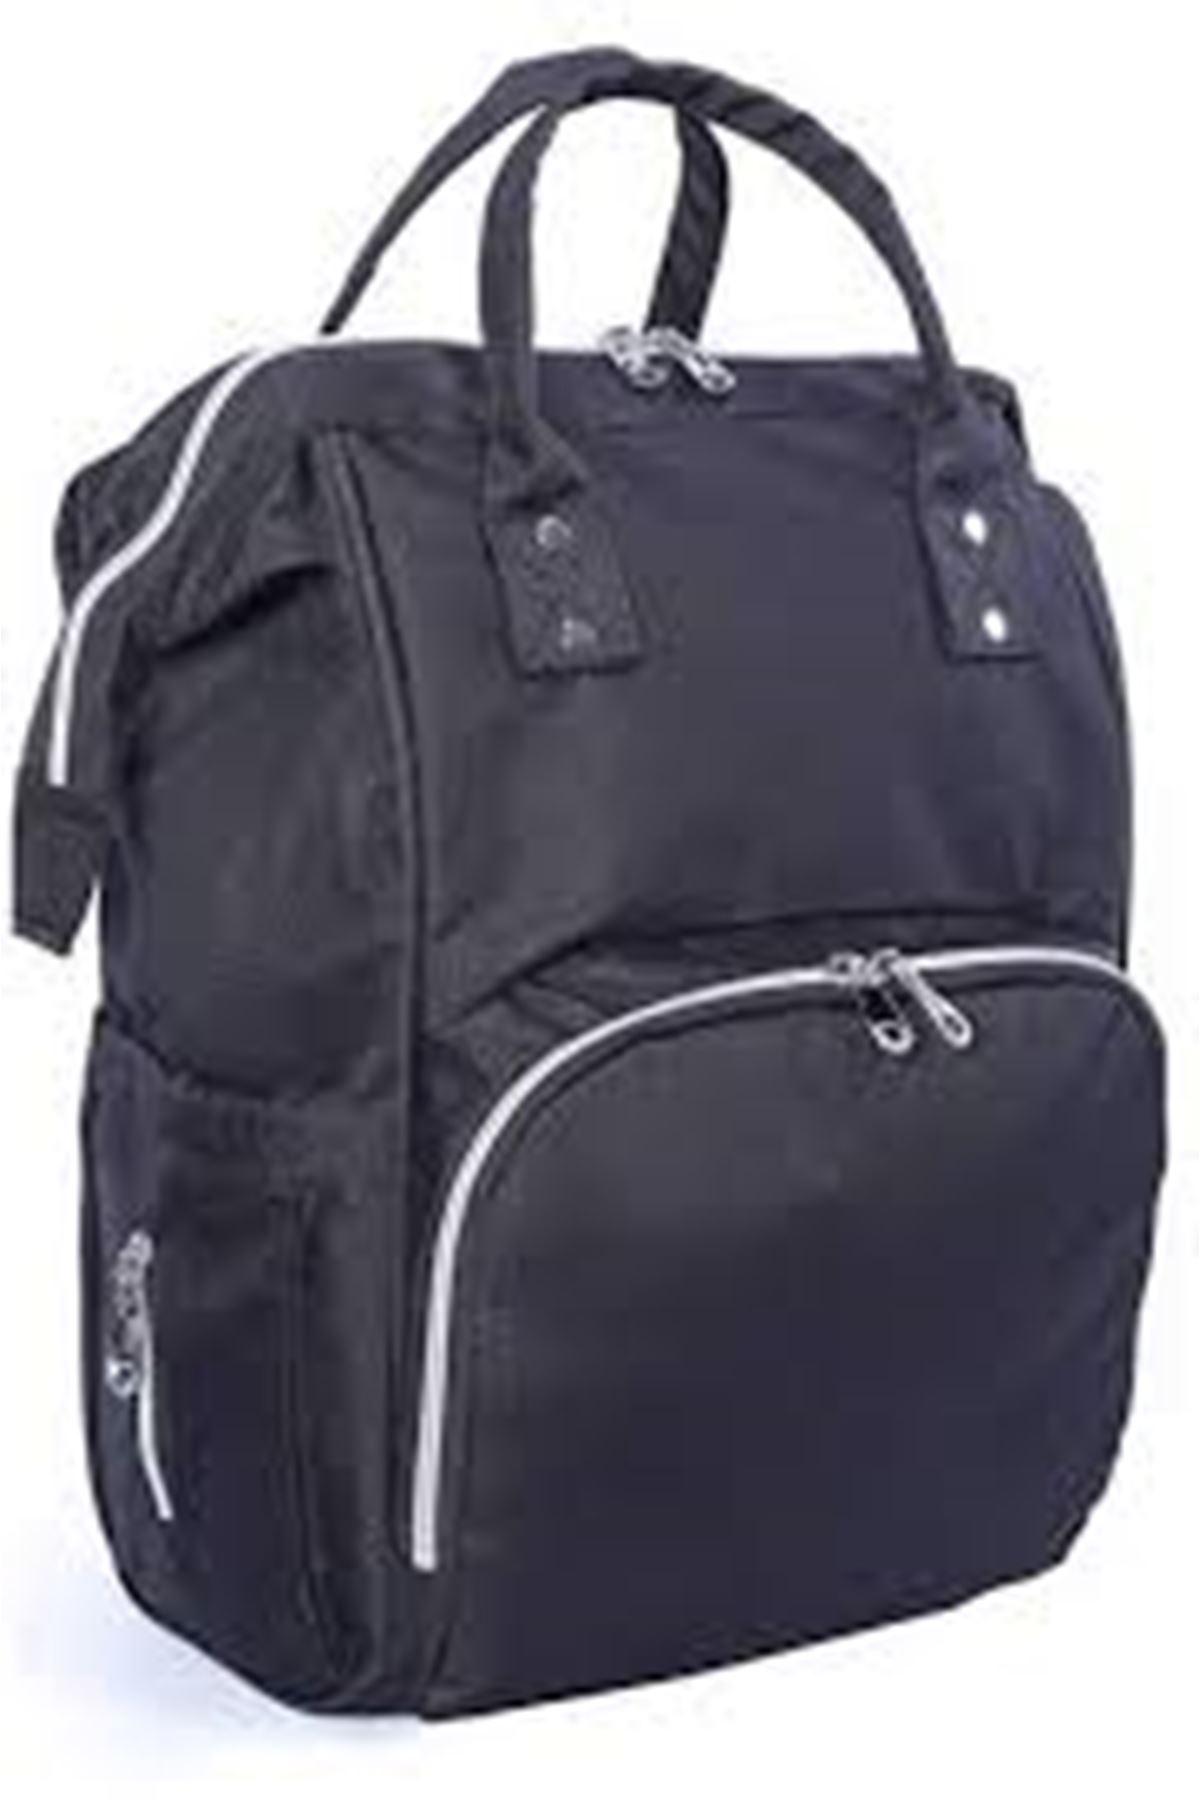 19033 Functional Mother Baby Bag- Black